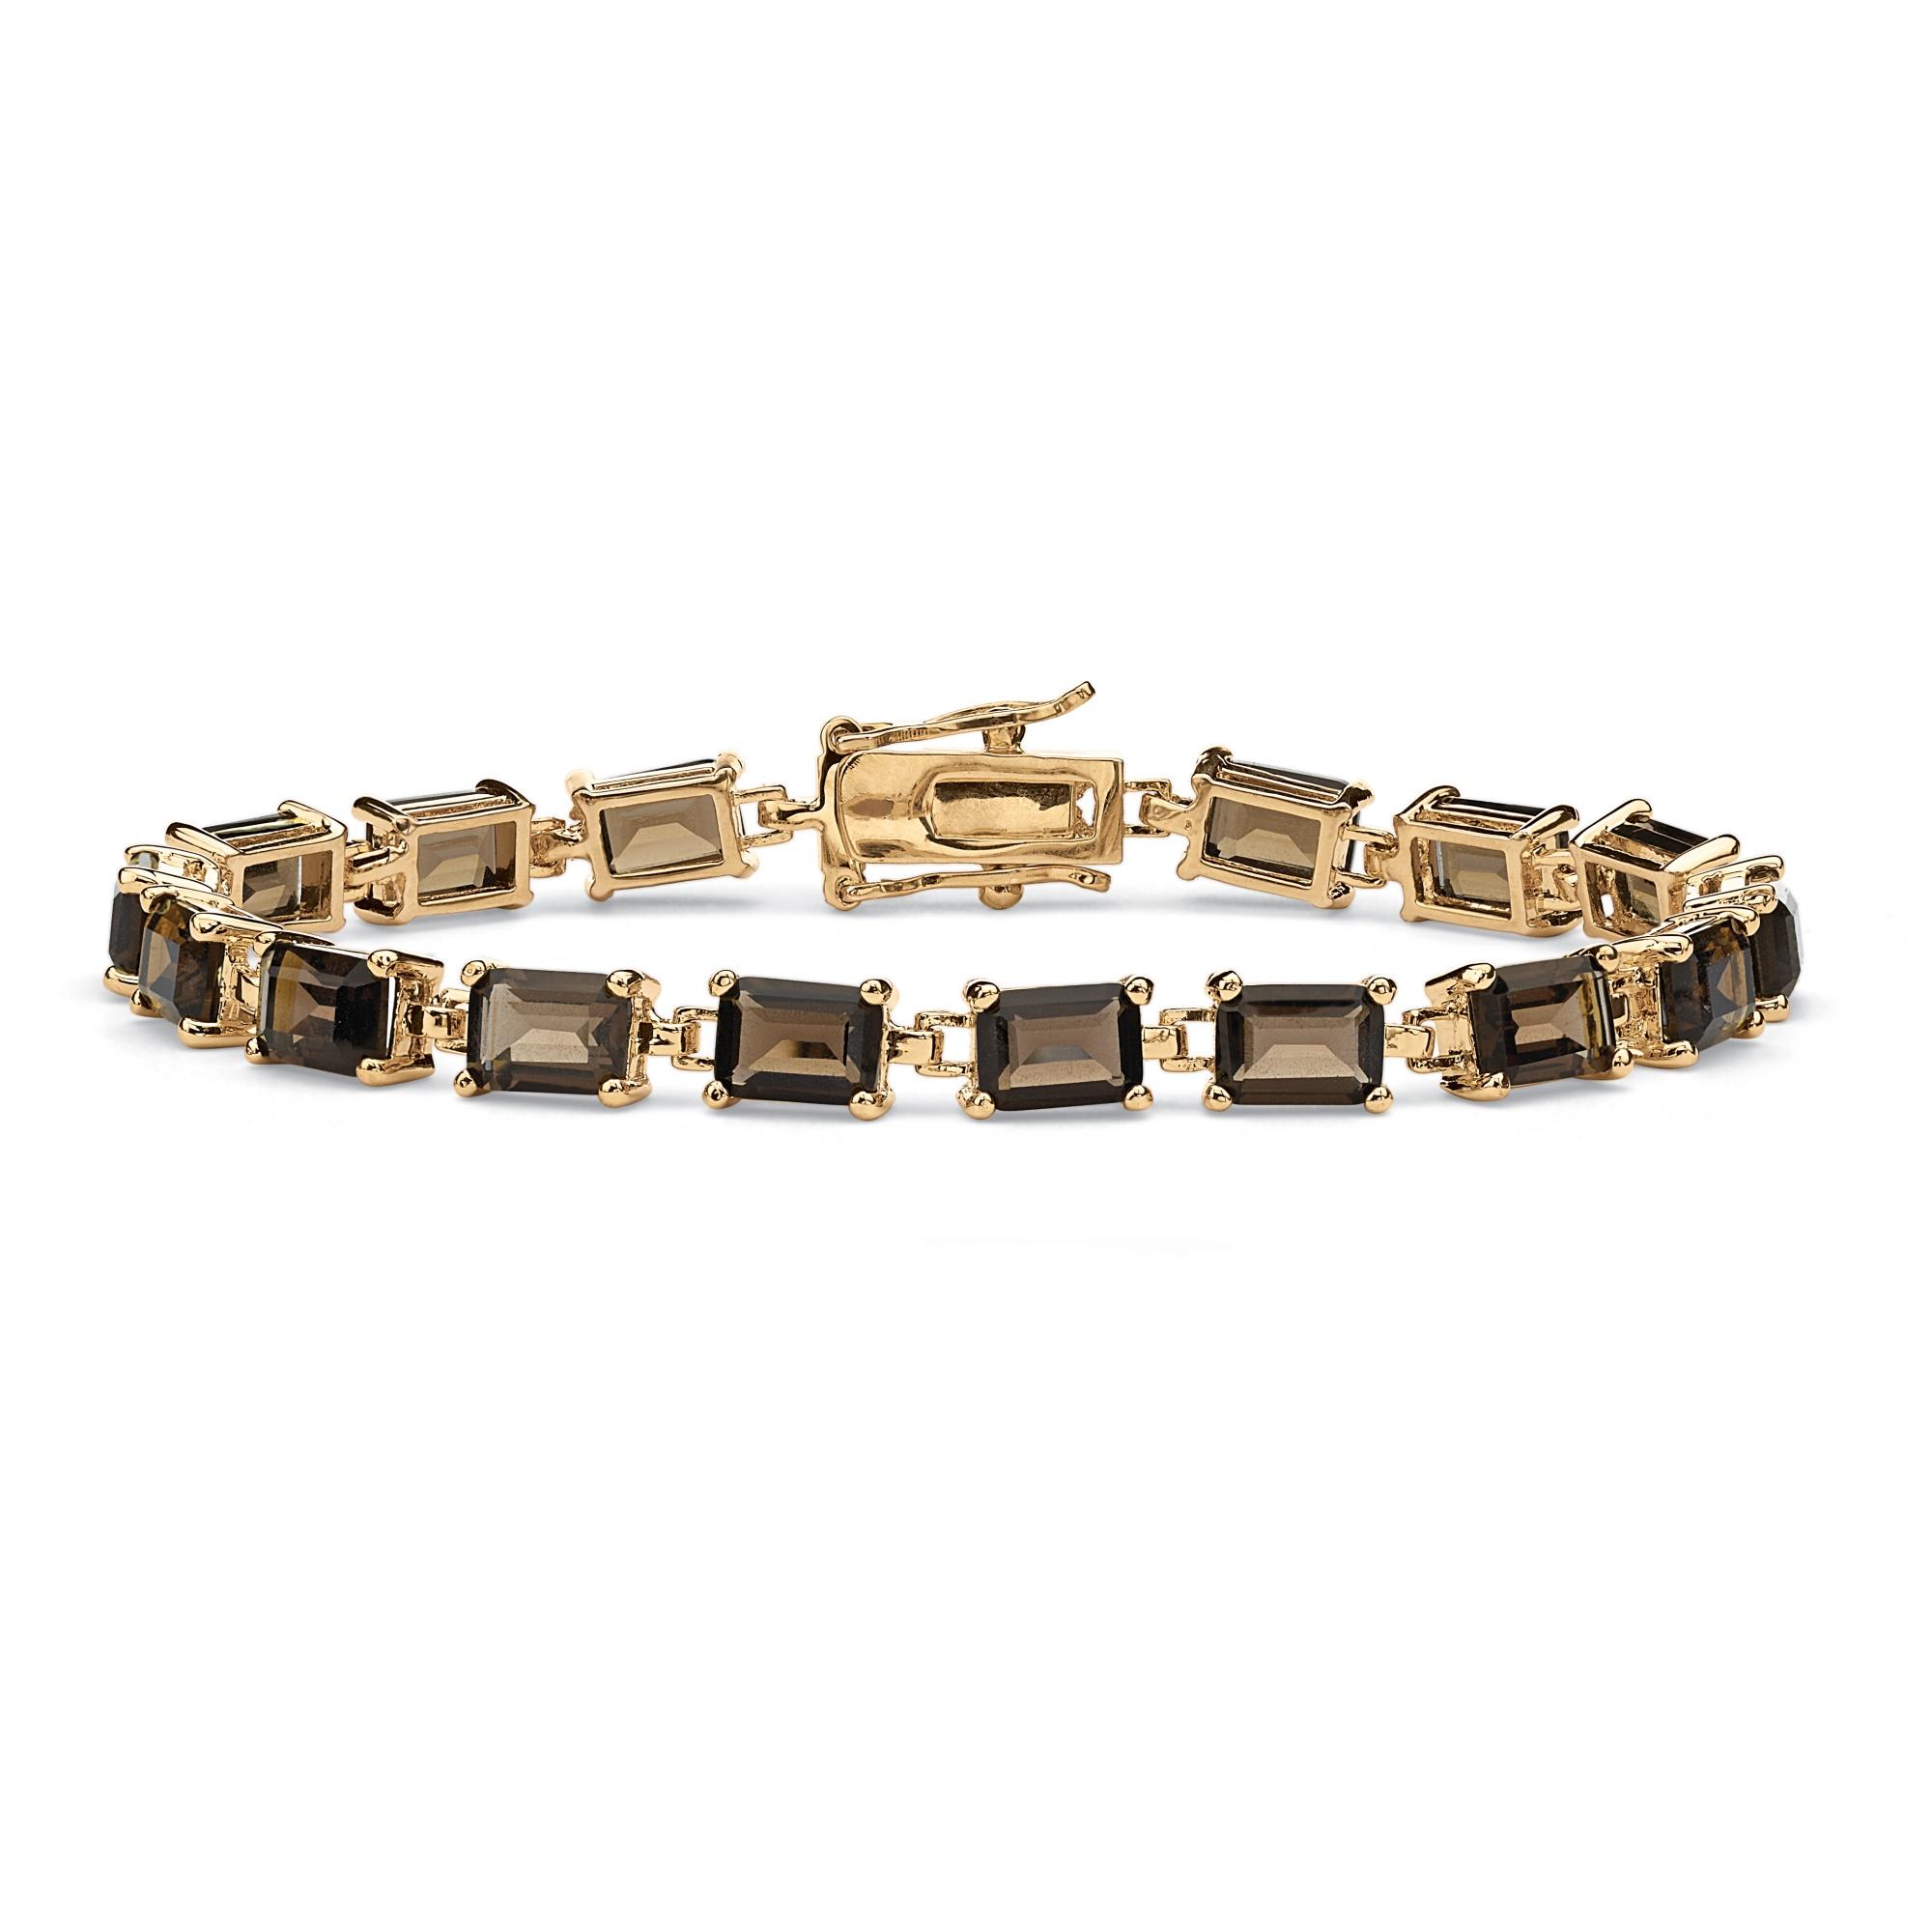 8af9886d827 16 TCW Emerald-Cut Genuine Smoky Quartz 14k Yellow Gold-Plated Tennis  Bracelet 7